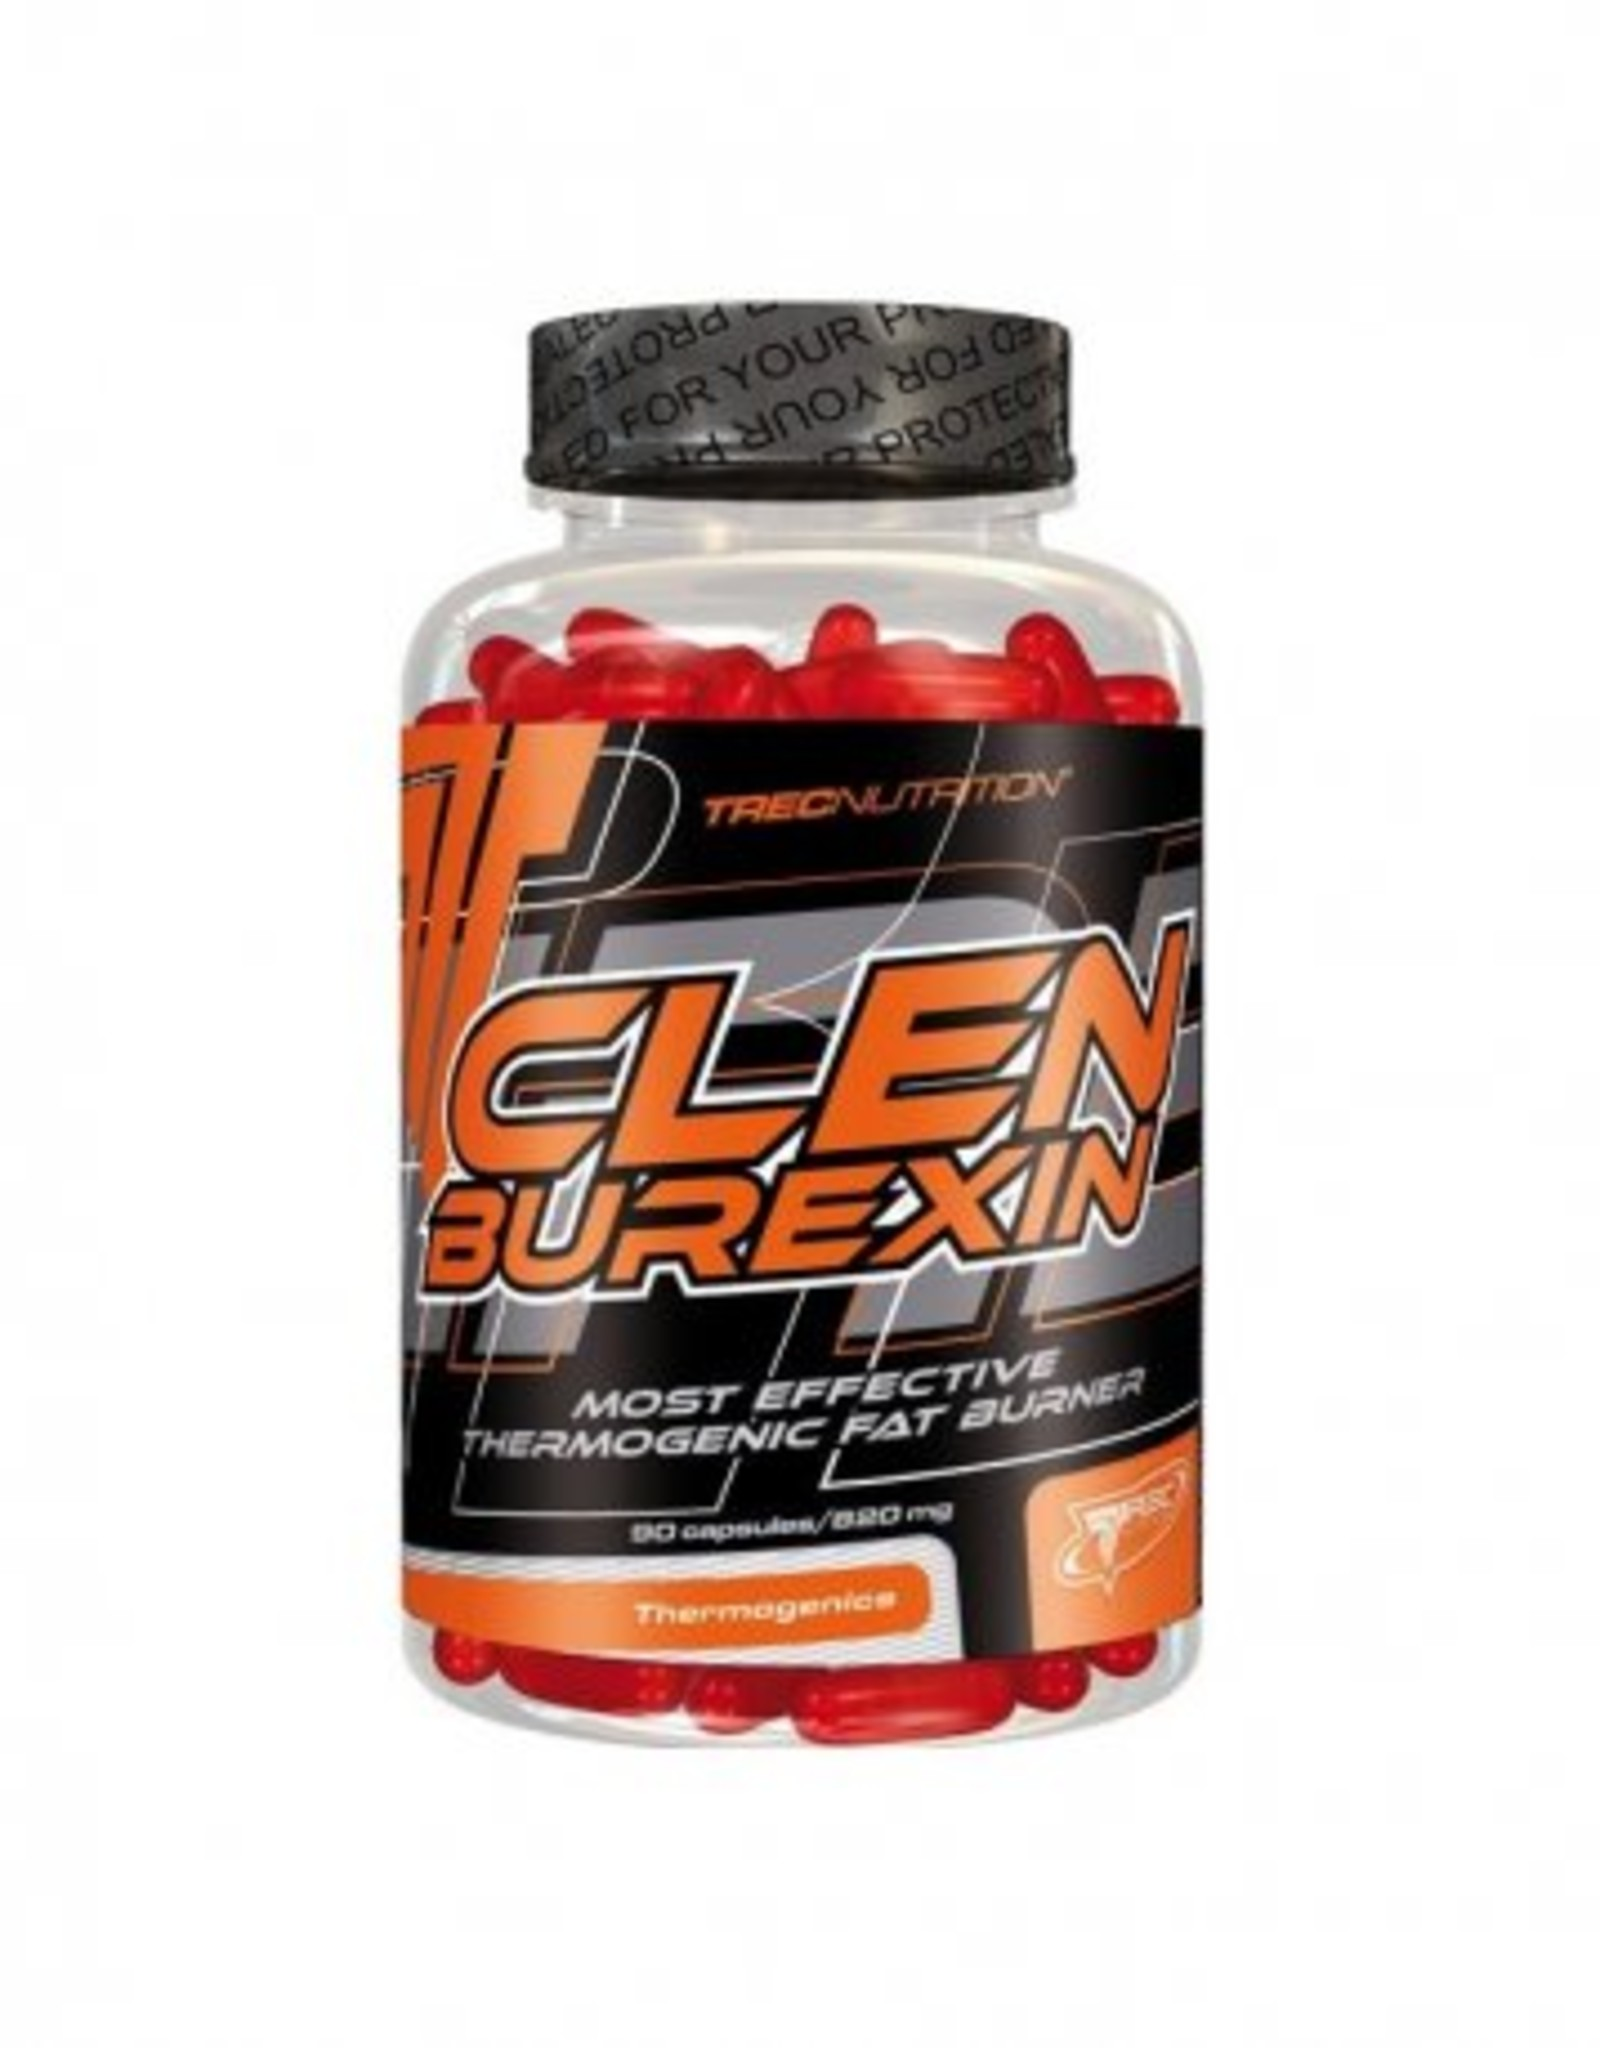 Trec  Clenburexin 90 capsules